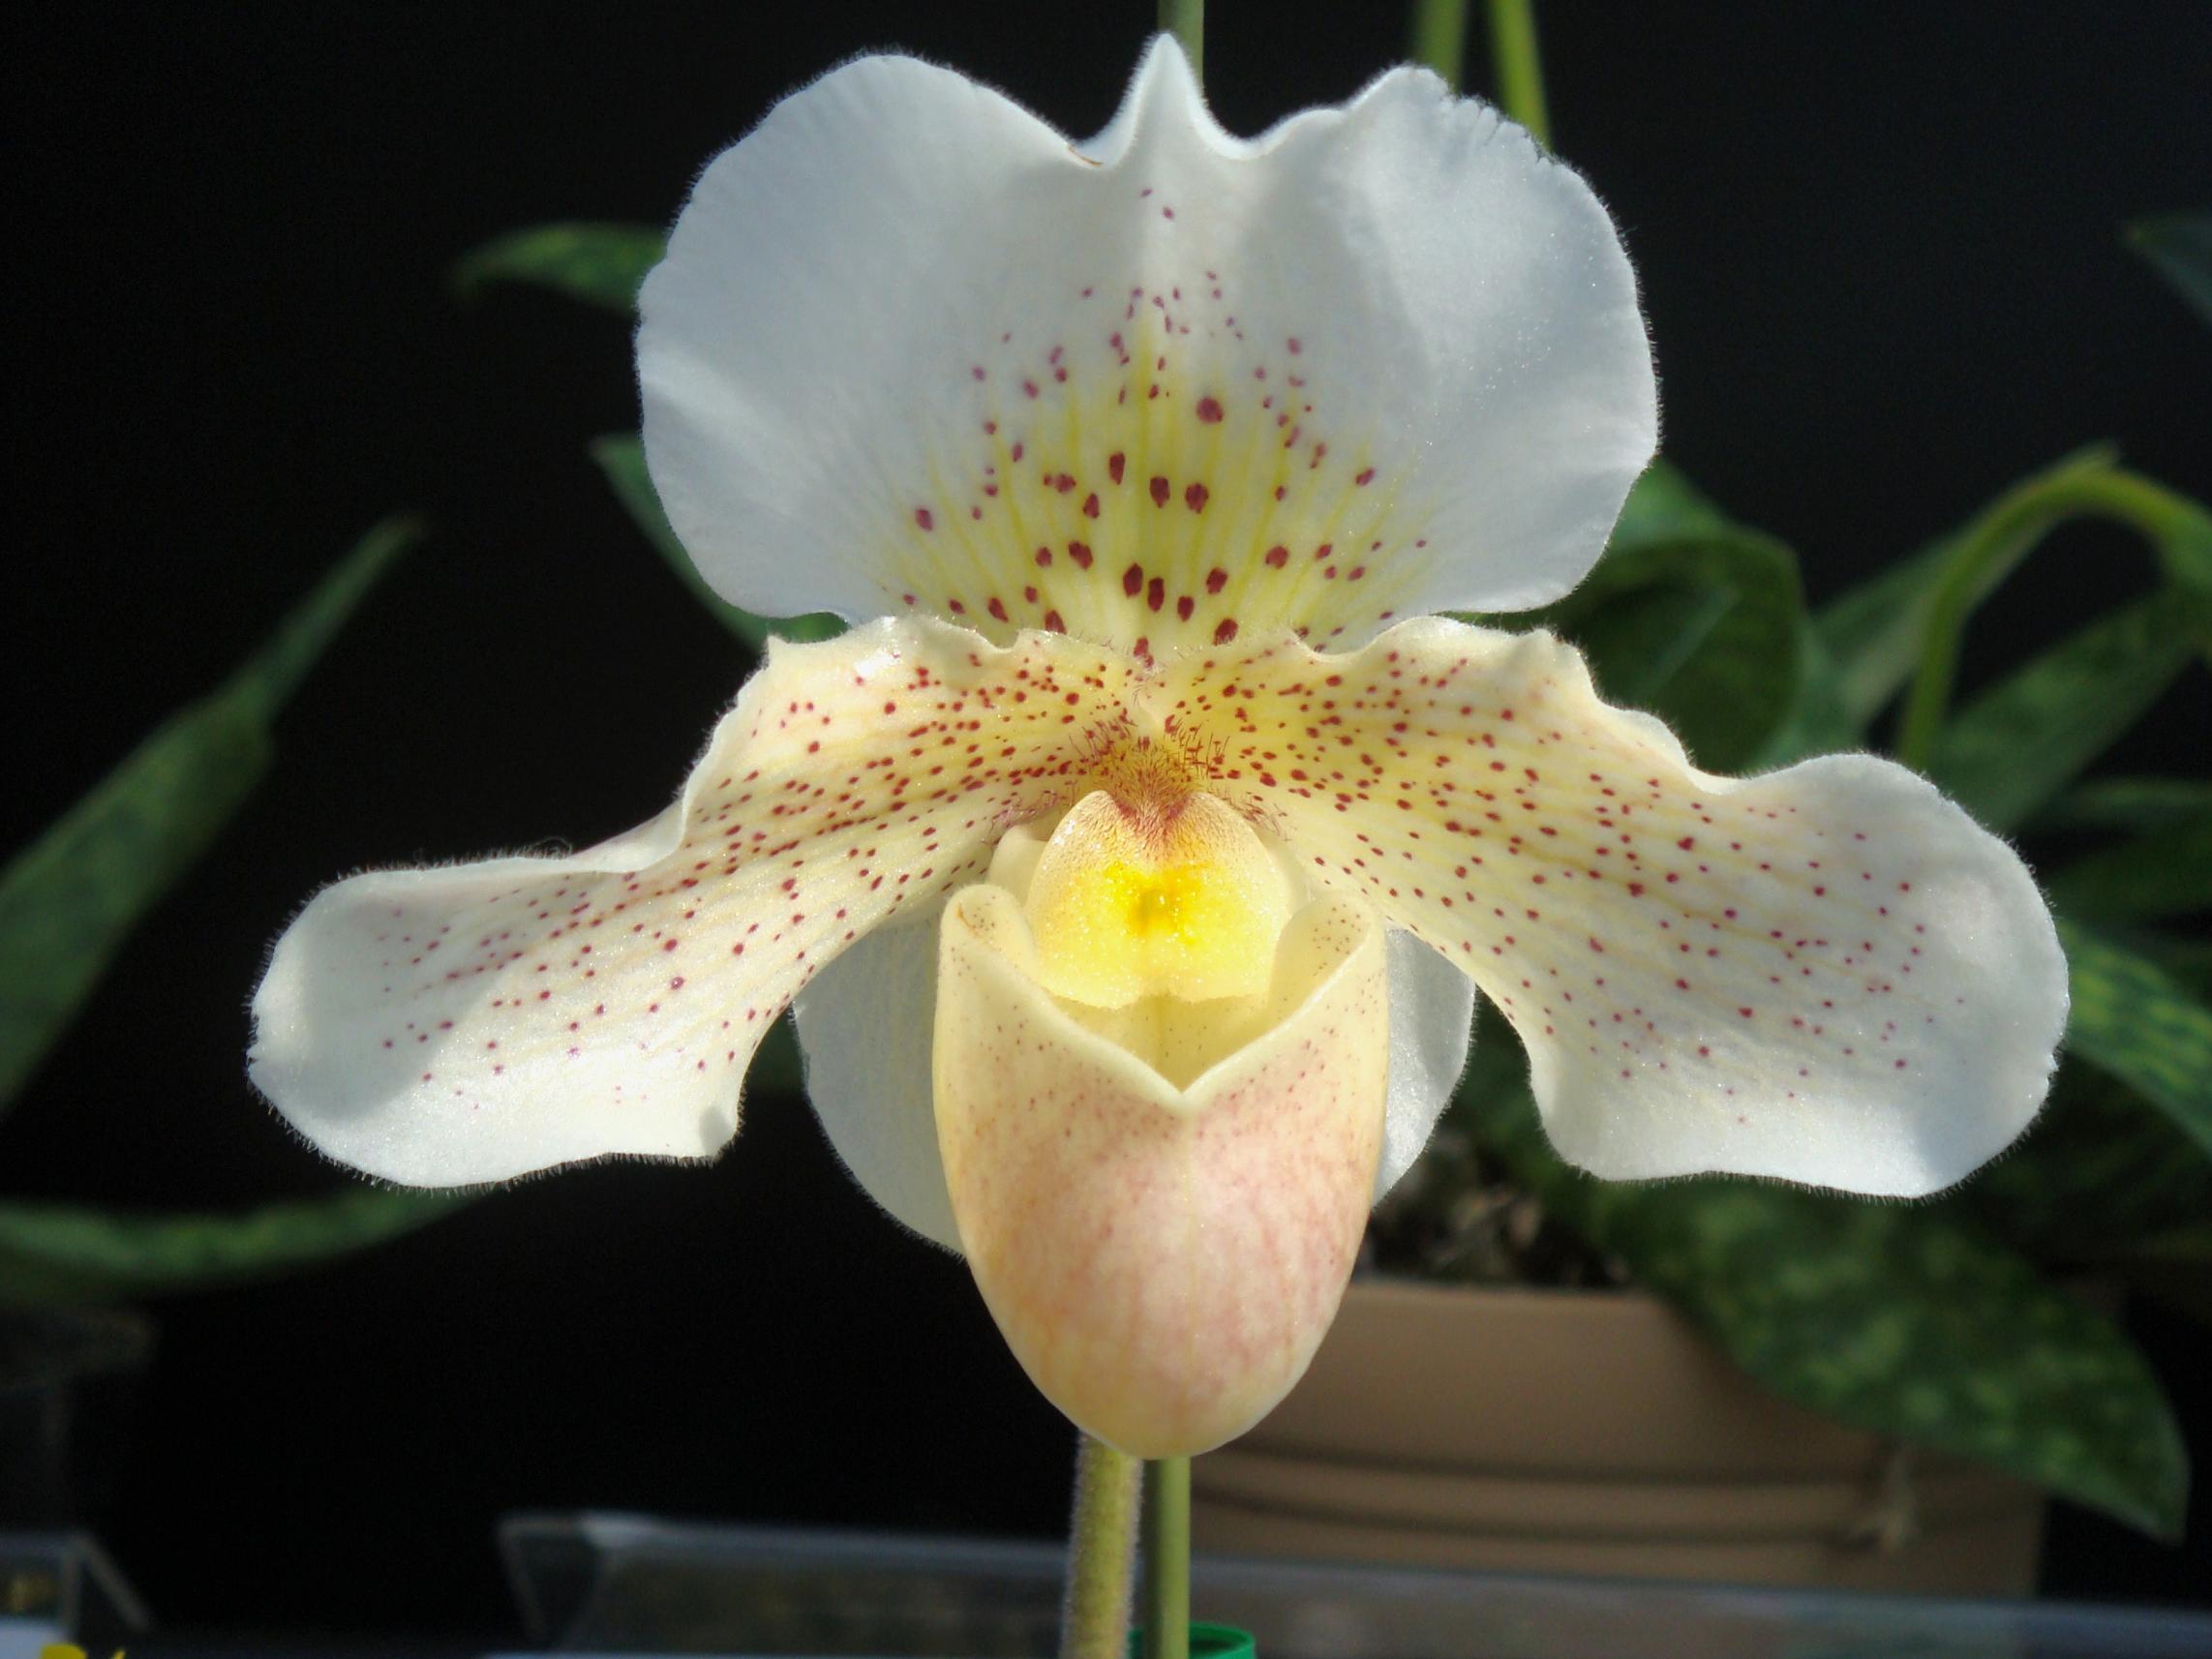 http://hybridorchid.la.coocan.jp/Paphiopedilum/Paphiopedilum%20Freckles/DSC09528.JPG